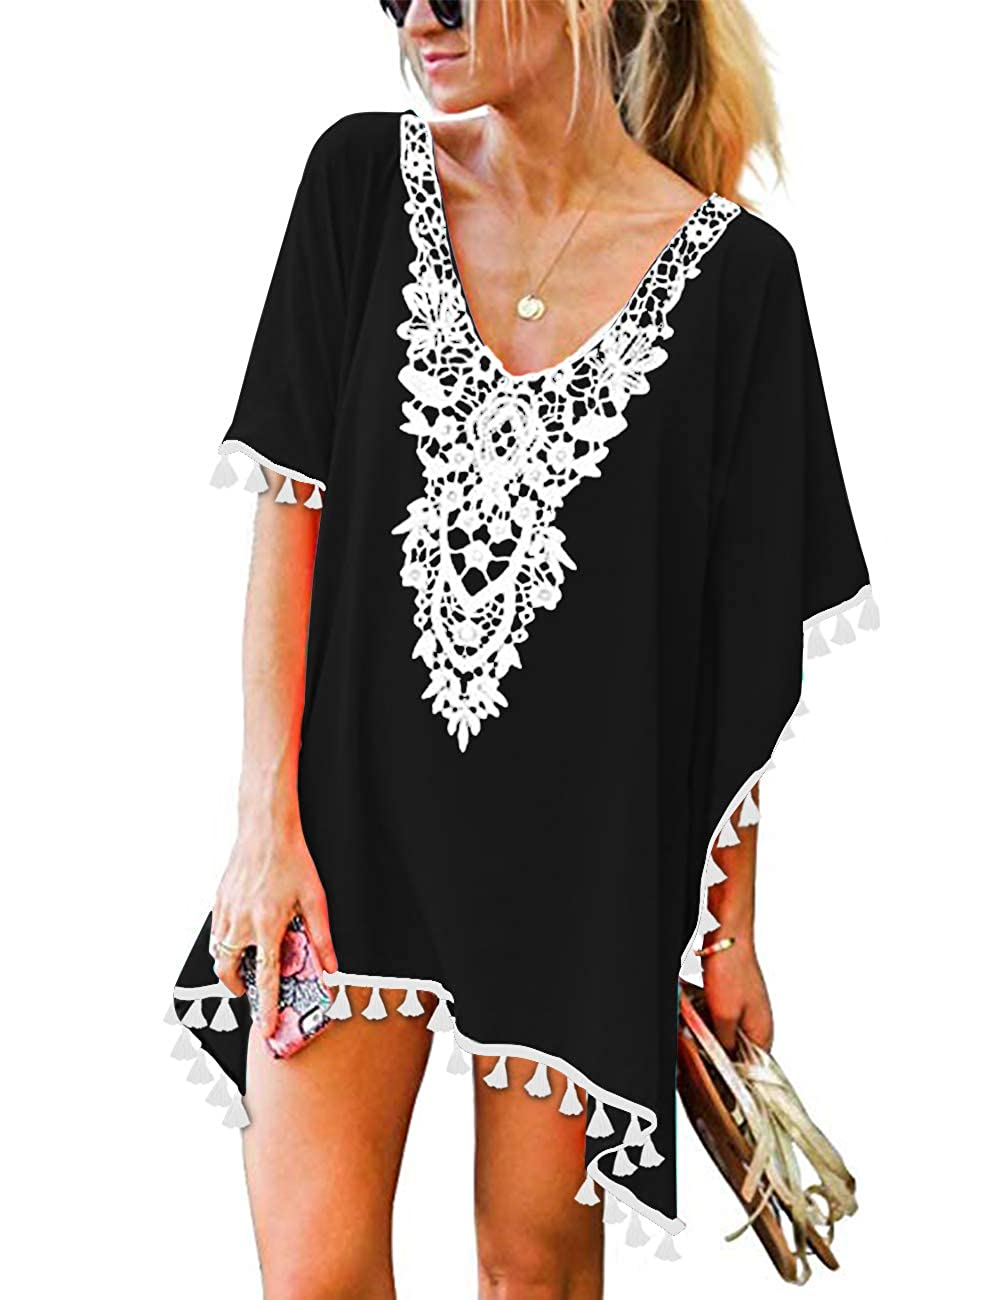 323b707800 CPOKRTWSO Women's Crochet Chiffon Tassel Swimsuit Beach Bikini Cover Ups  for Swimwear